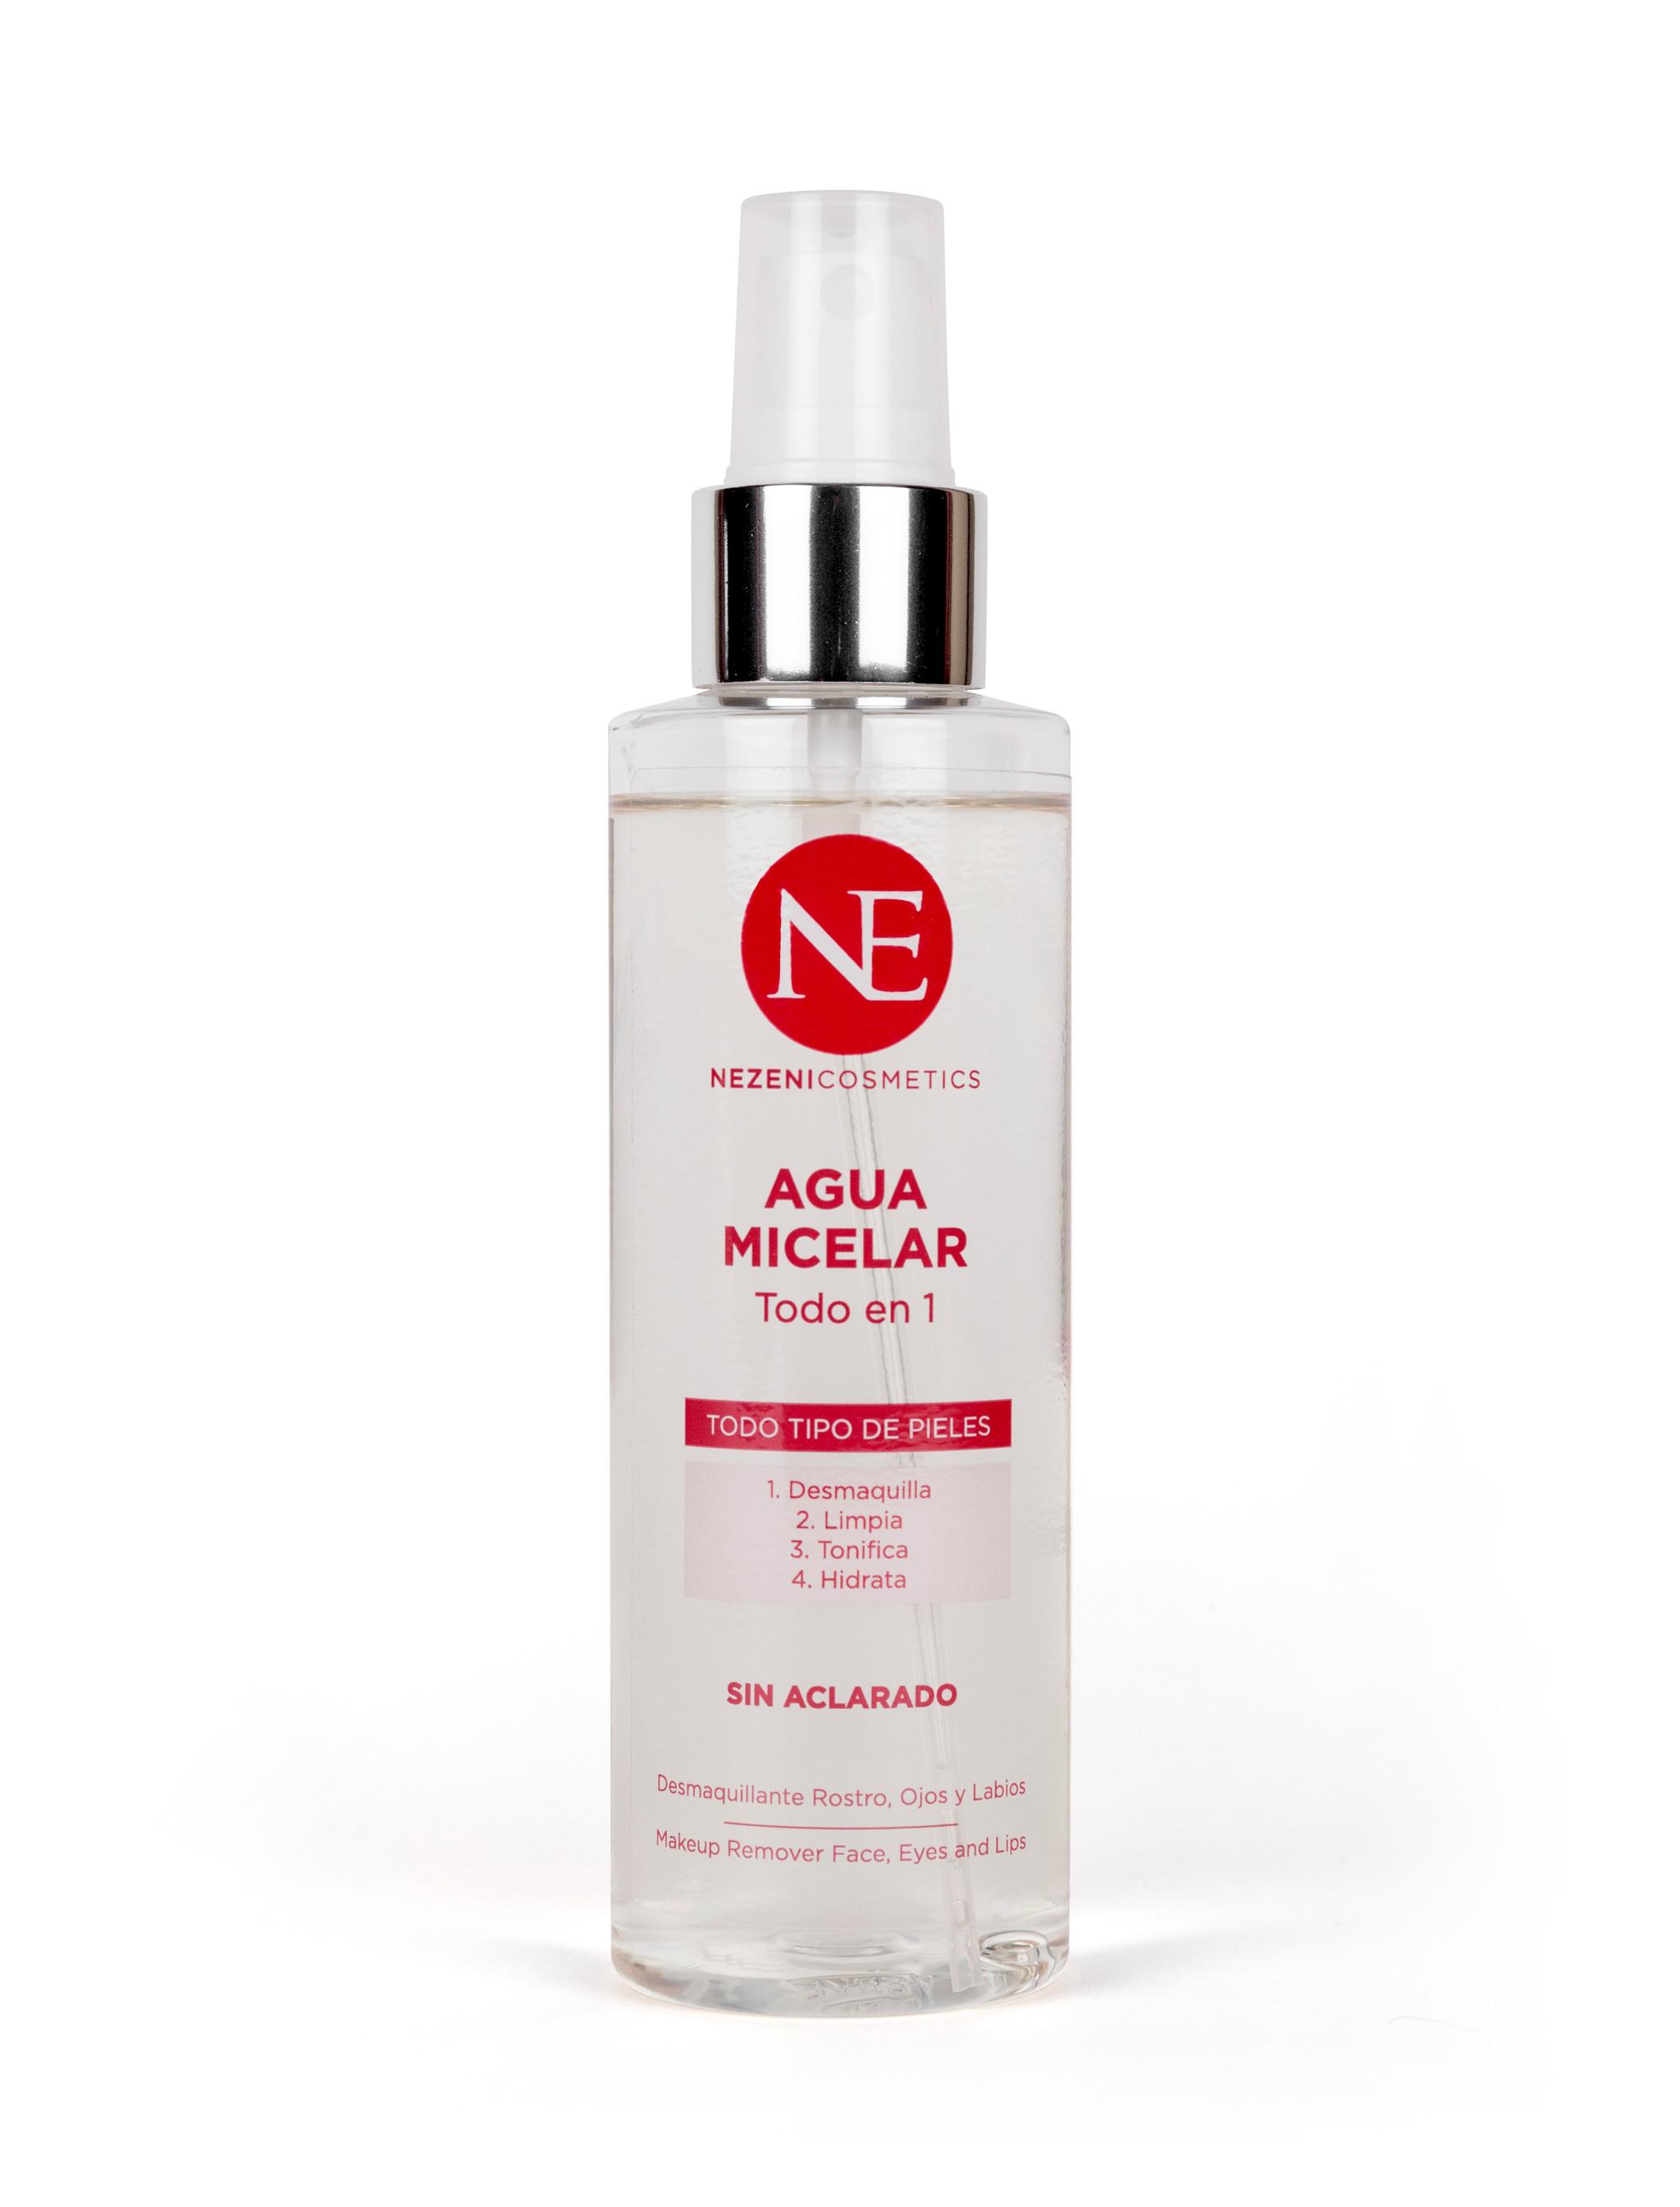 Agua micelar de Nezeni Cosmetics (19,90 euros)